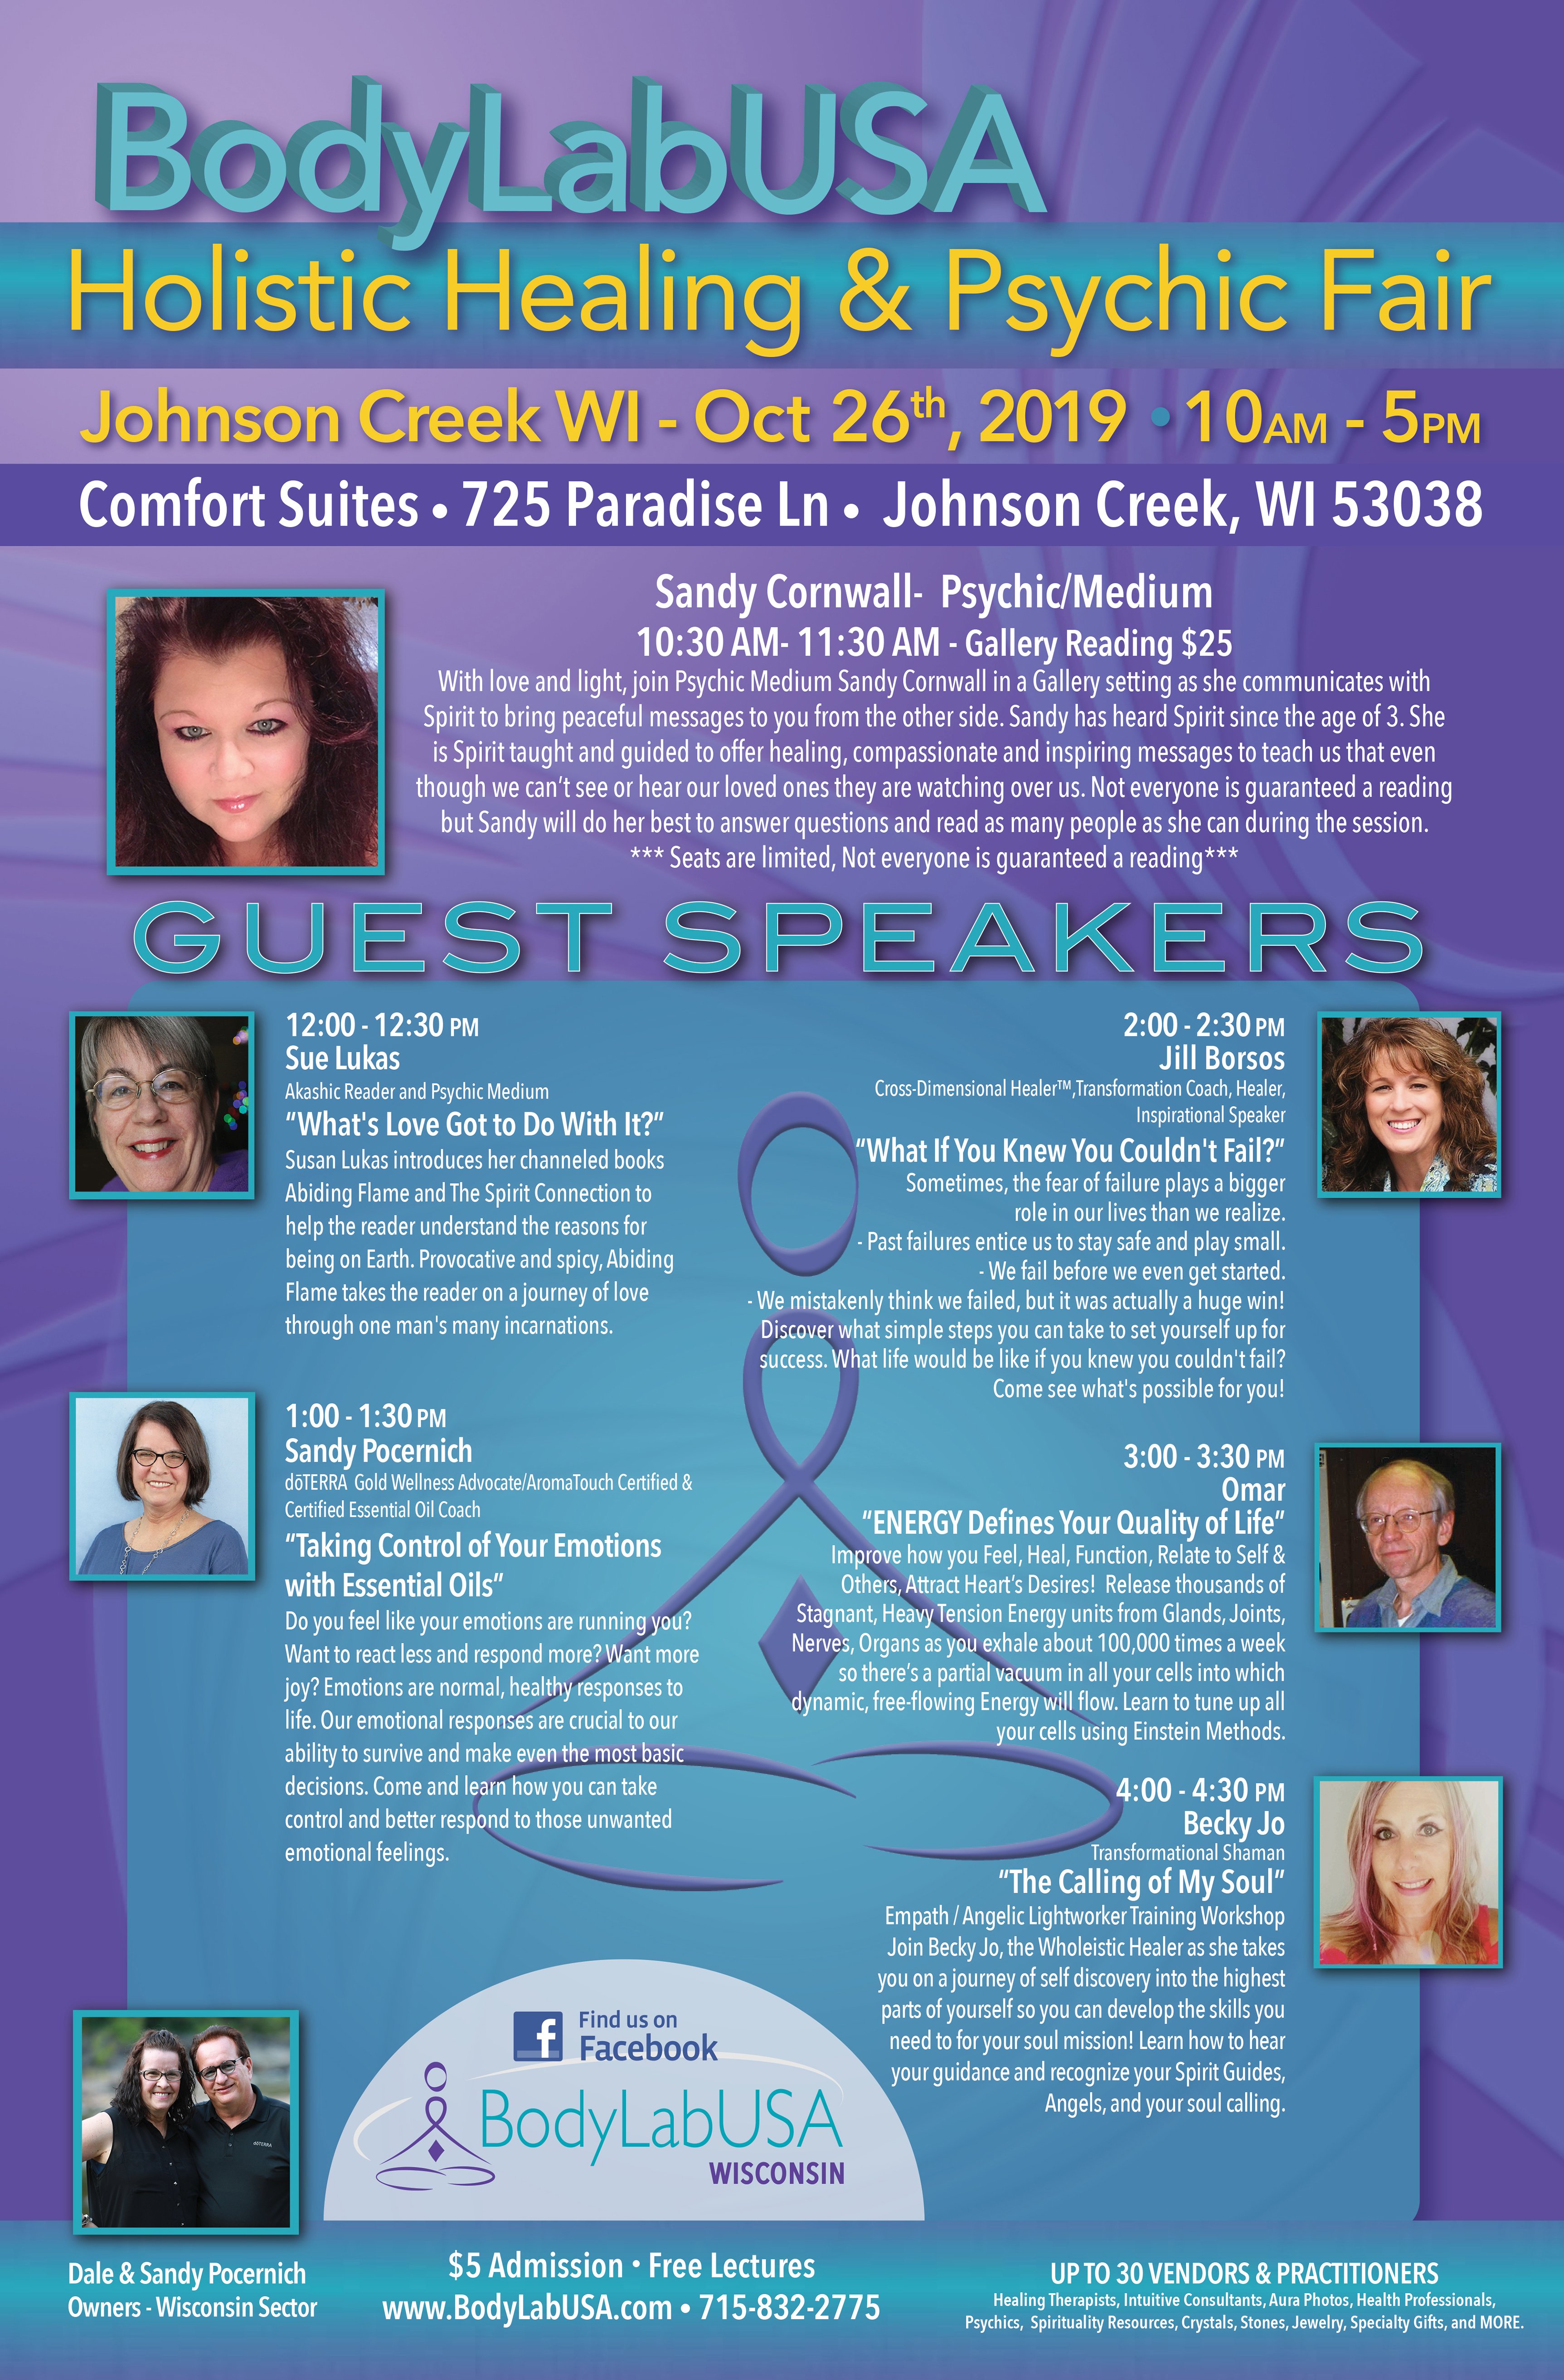 BodyLabUSA: Holistic Healing & Psychic Fair